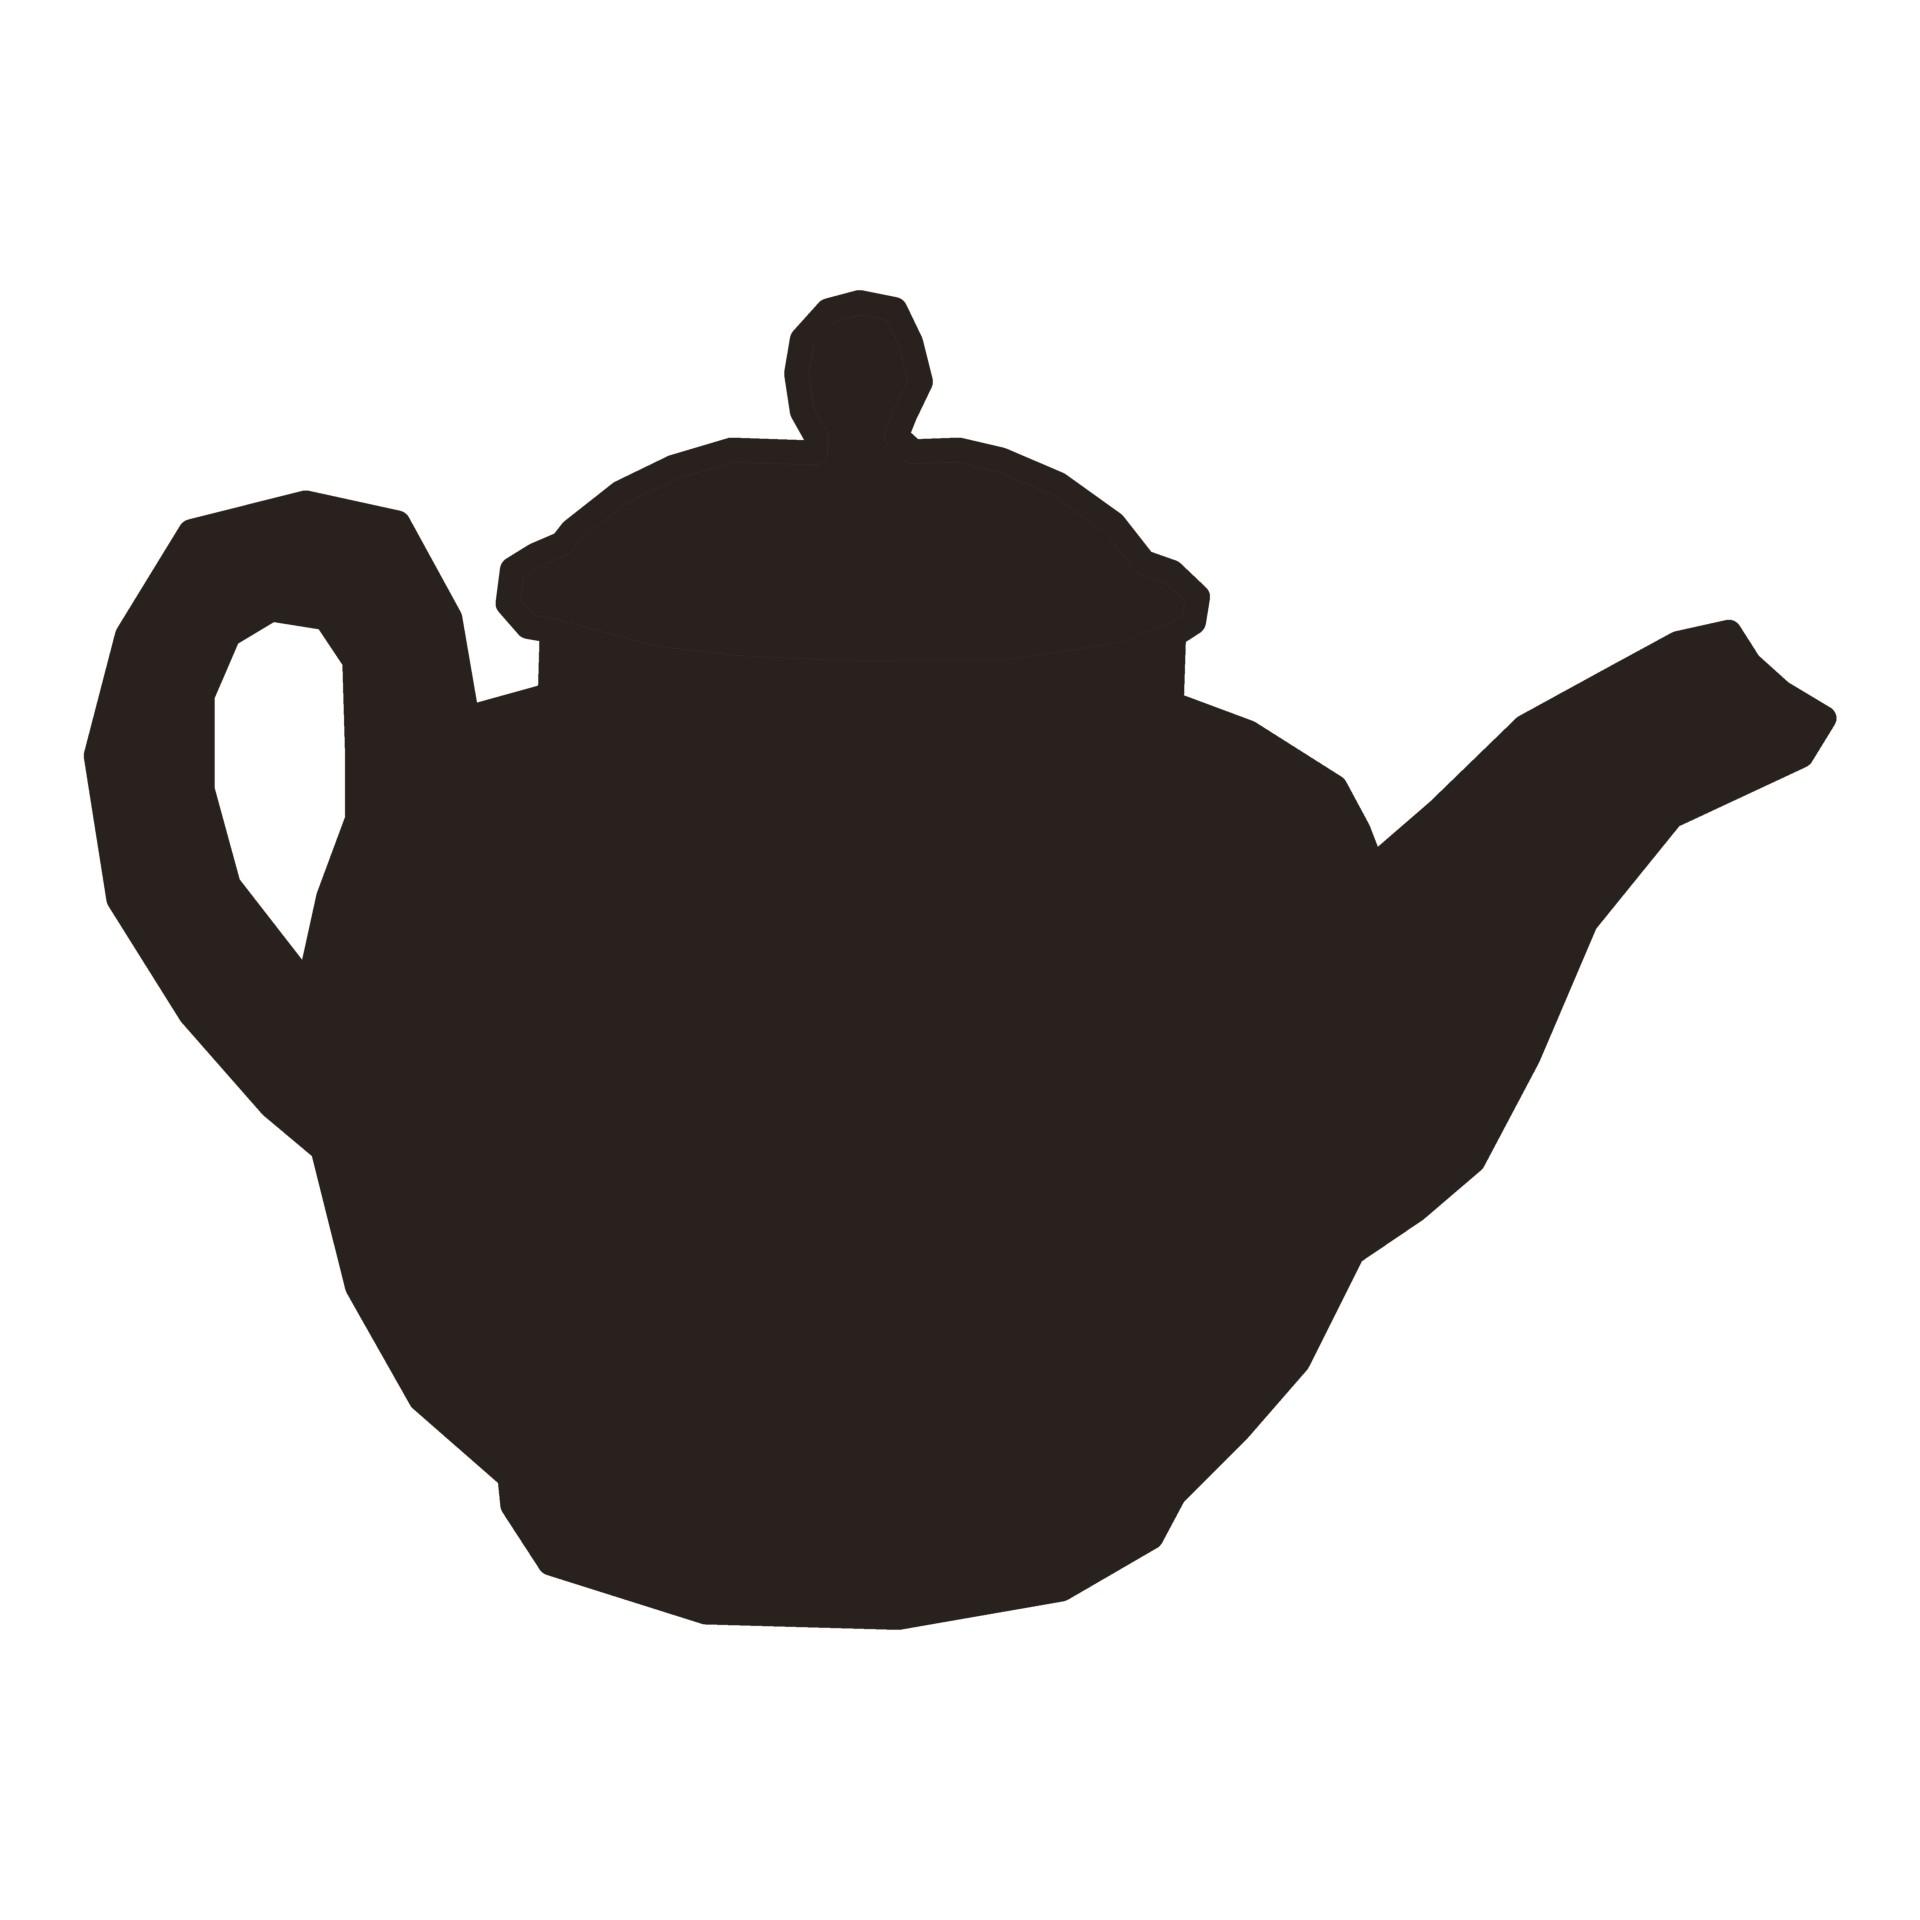 1920x1920 Teapot Silhouette Ii Free Stock Photo